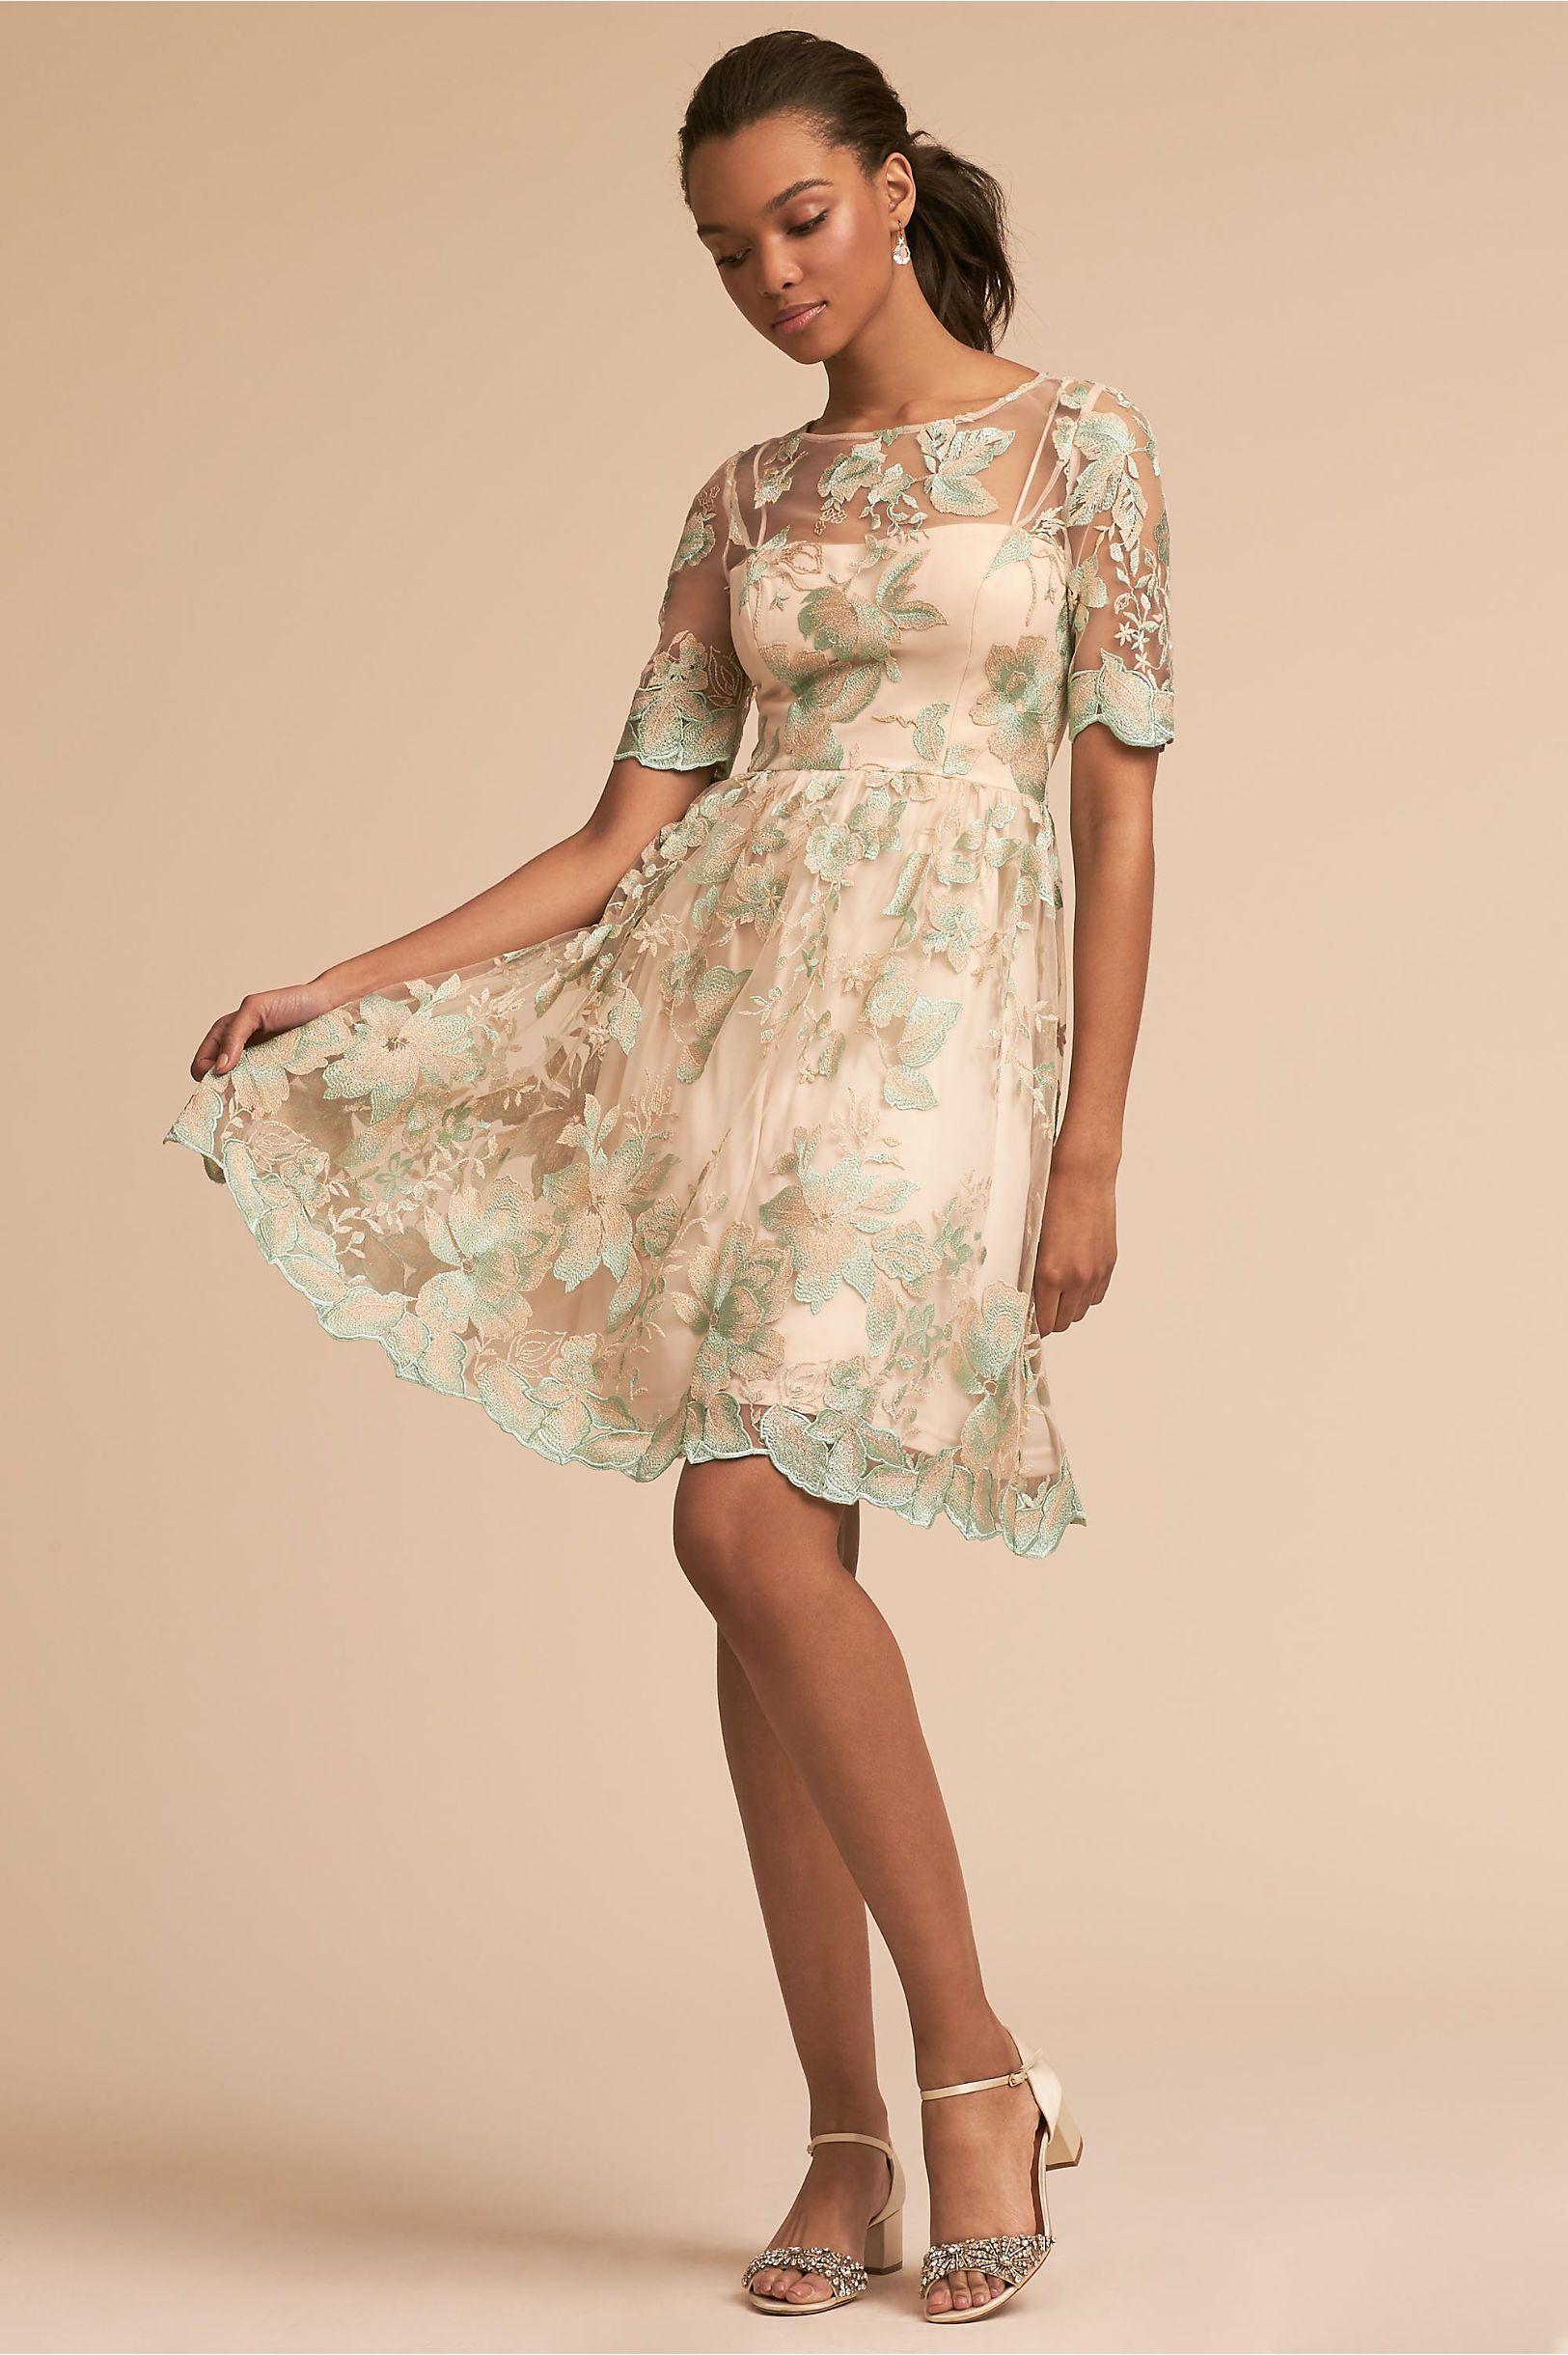 f2ec94d332f2 BHLDN Nadine Dress Morning Mist in Occasion Dresses | BHLDN ...